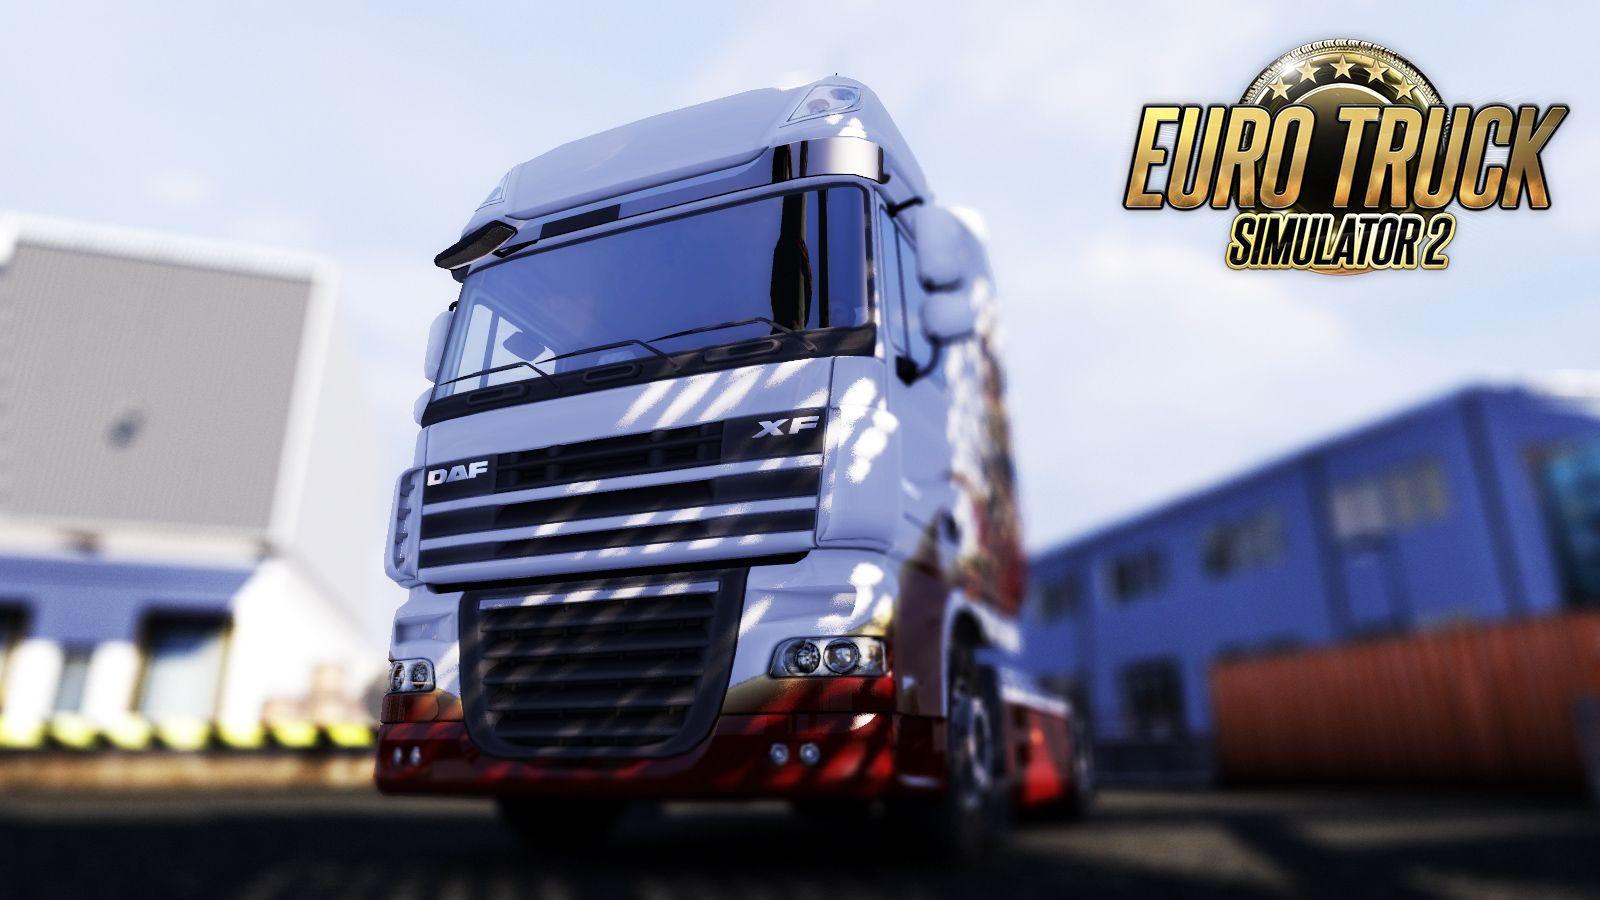 euro truck simulator pc game free download full version